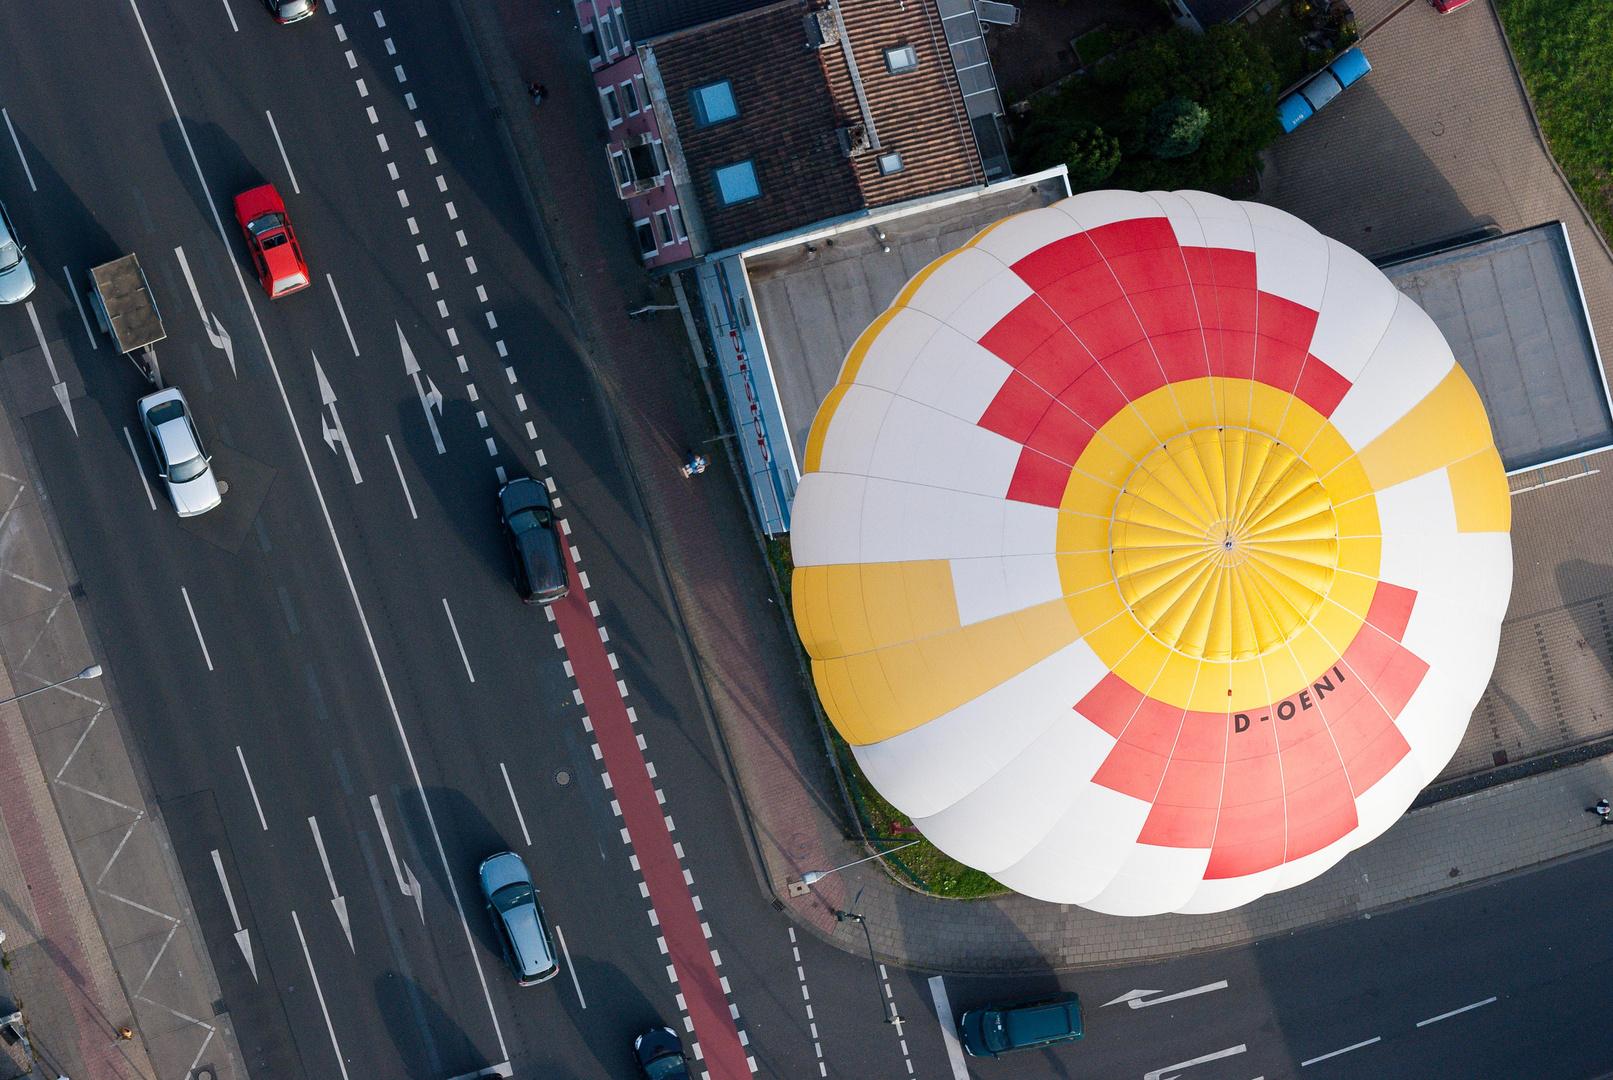 Balon über Aachen